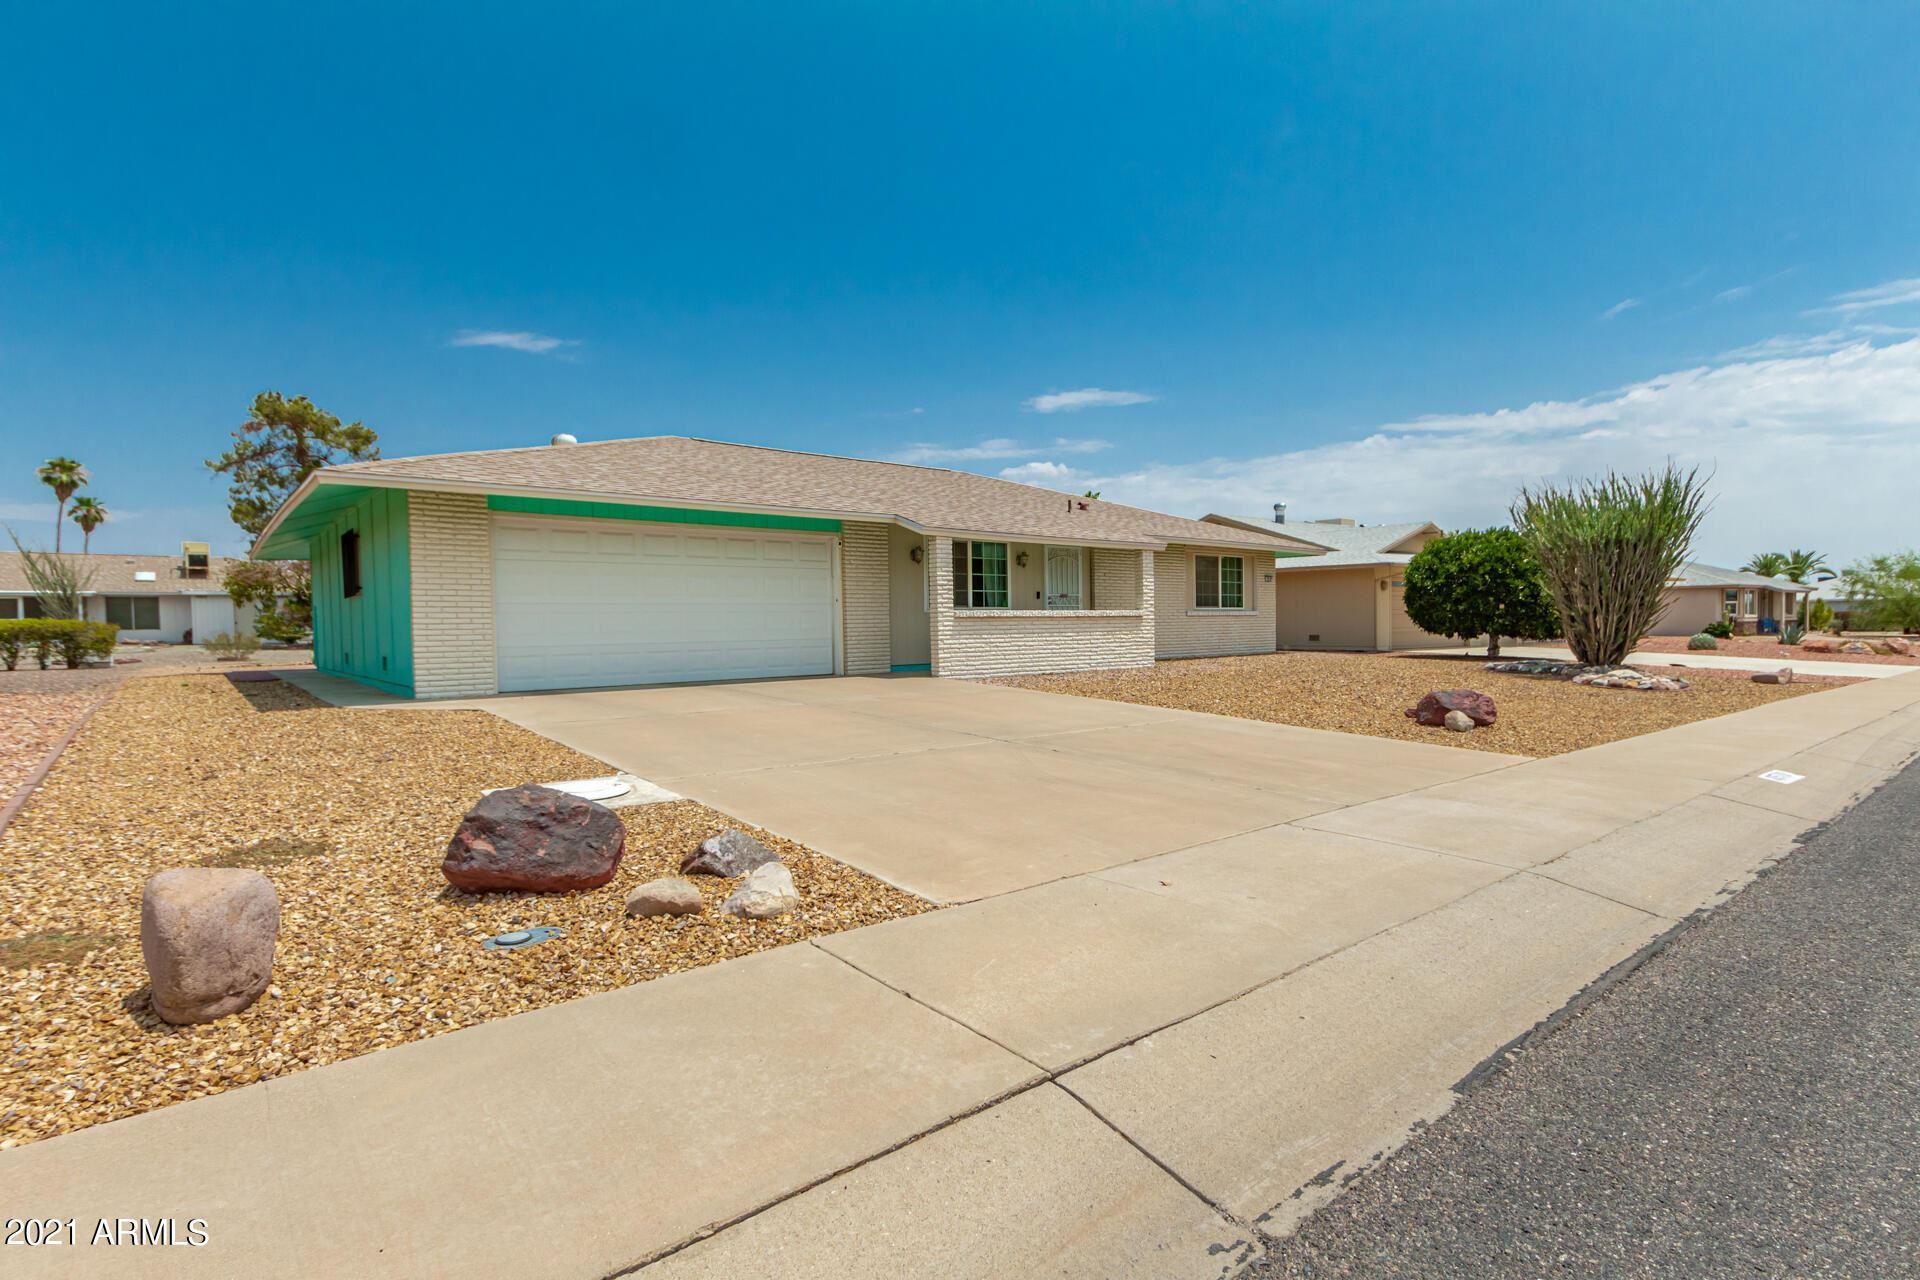 Photo of 9510 W WILLOWBROOK Drive, Sun City, AZ 85373 (MLS # 6268917)